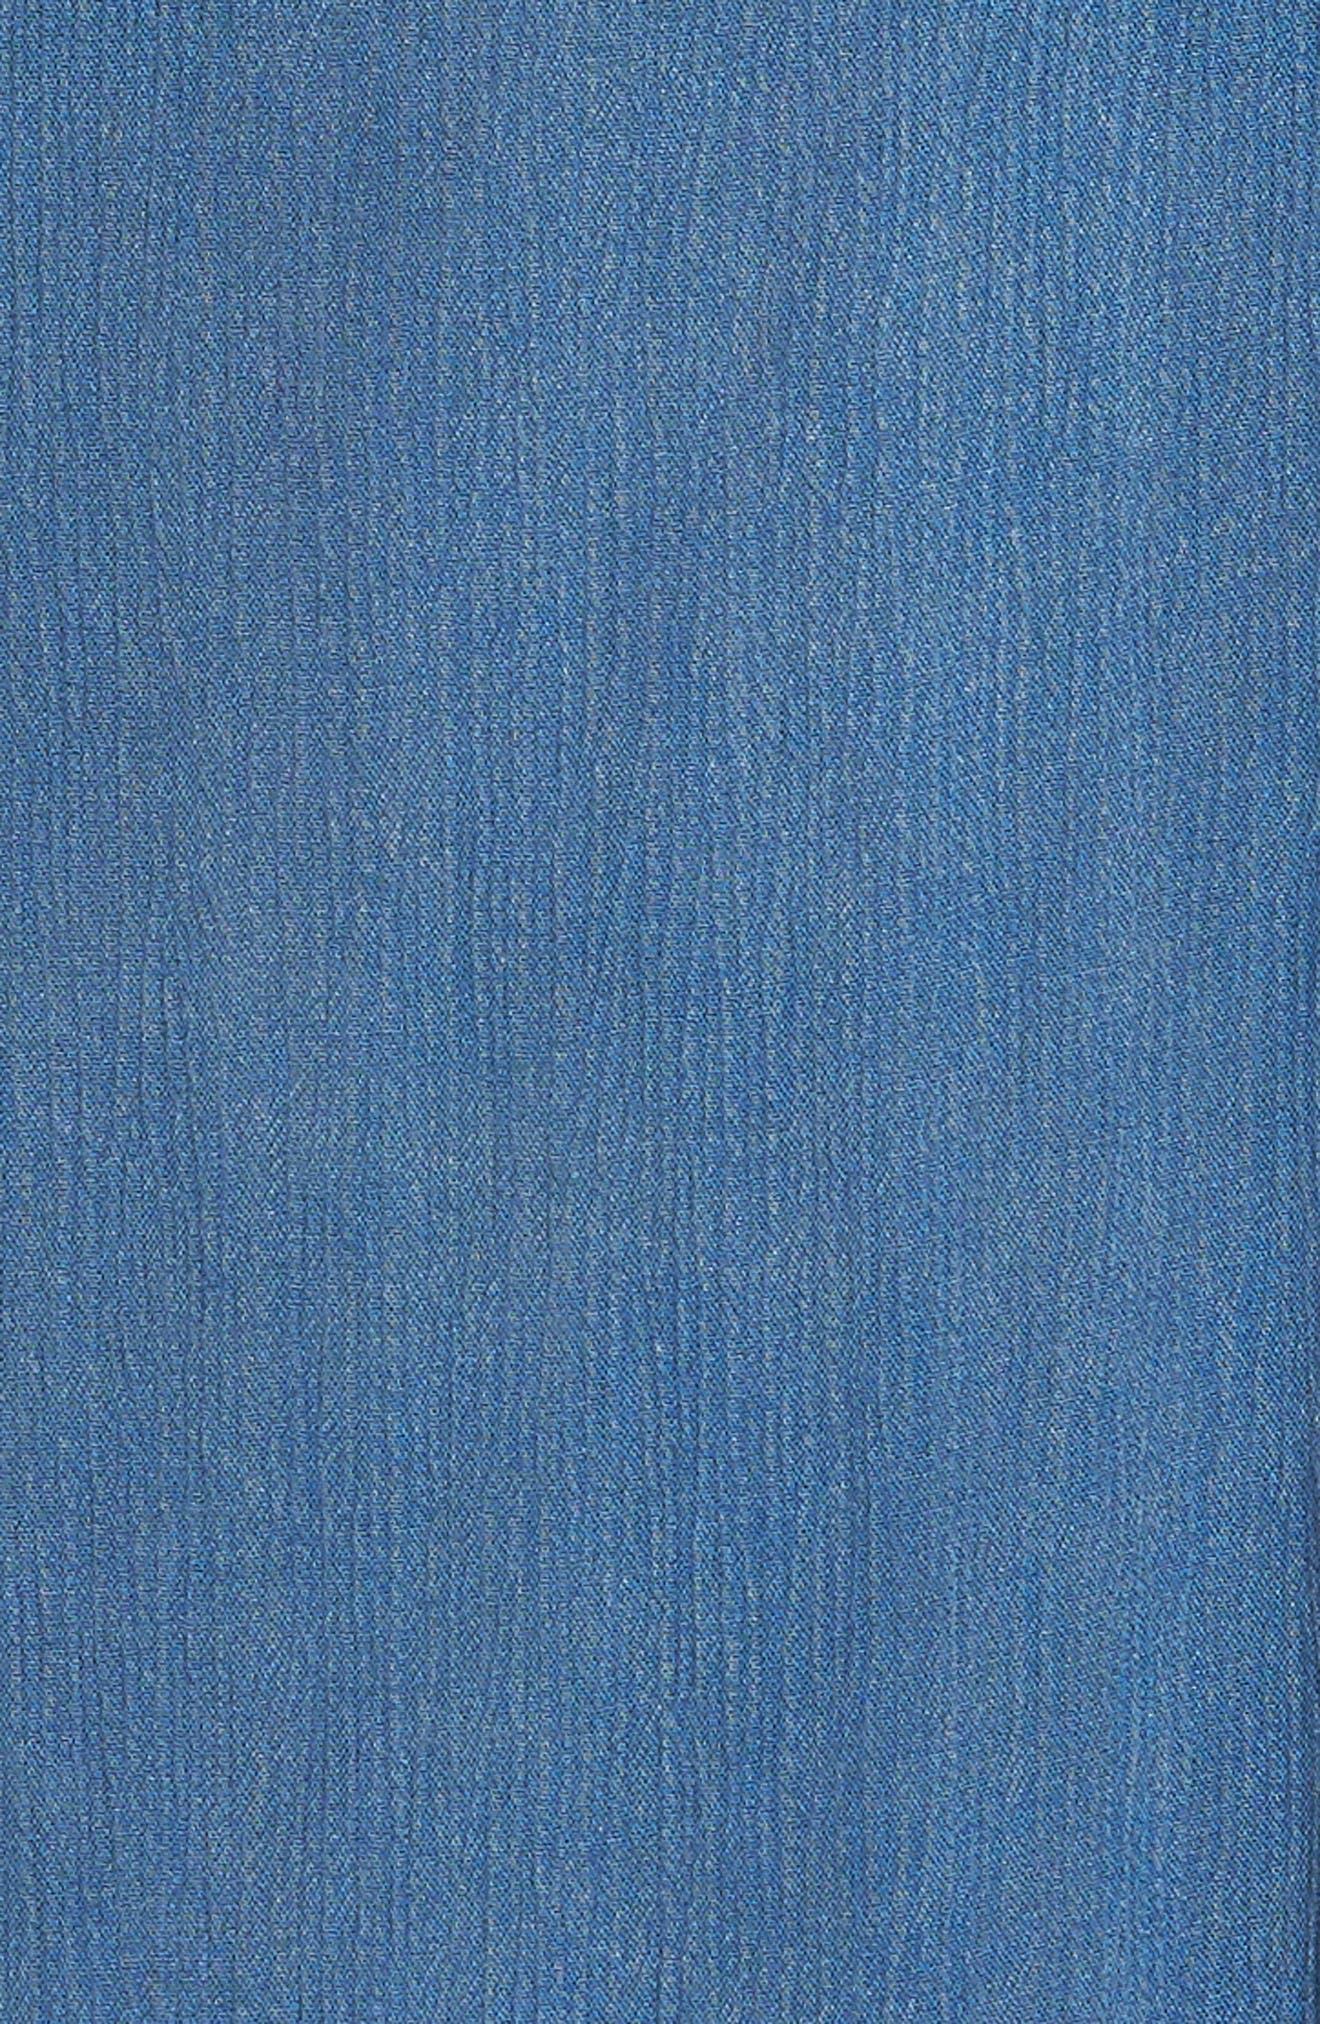 Gavin Ruffle Cover-Up Dress,                             Alternate thumbnail 5, color,                             462